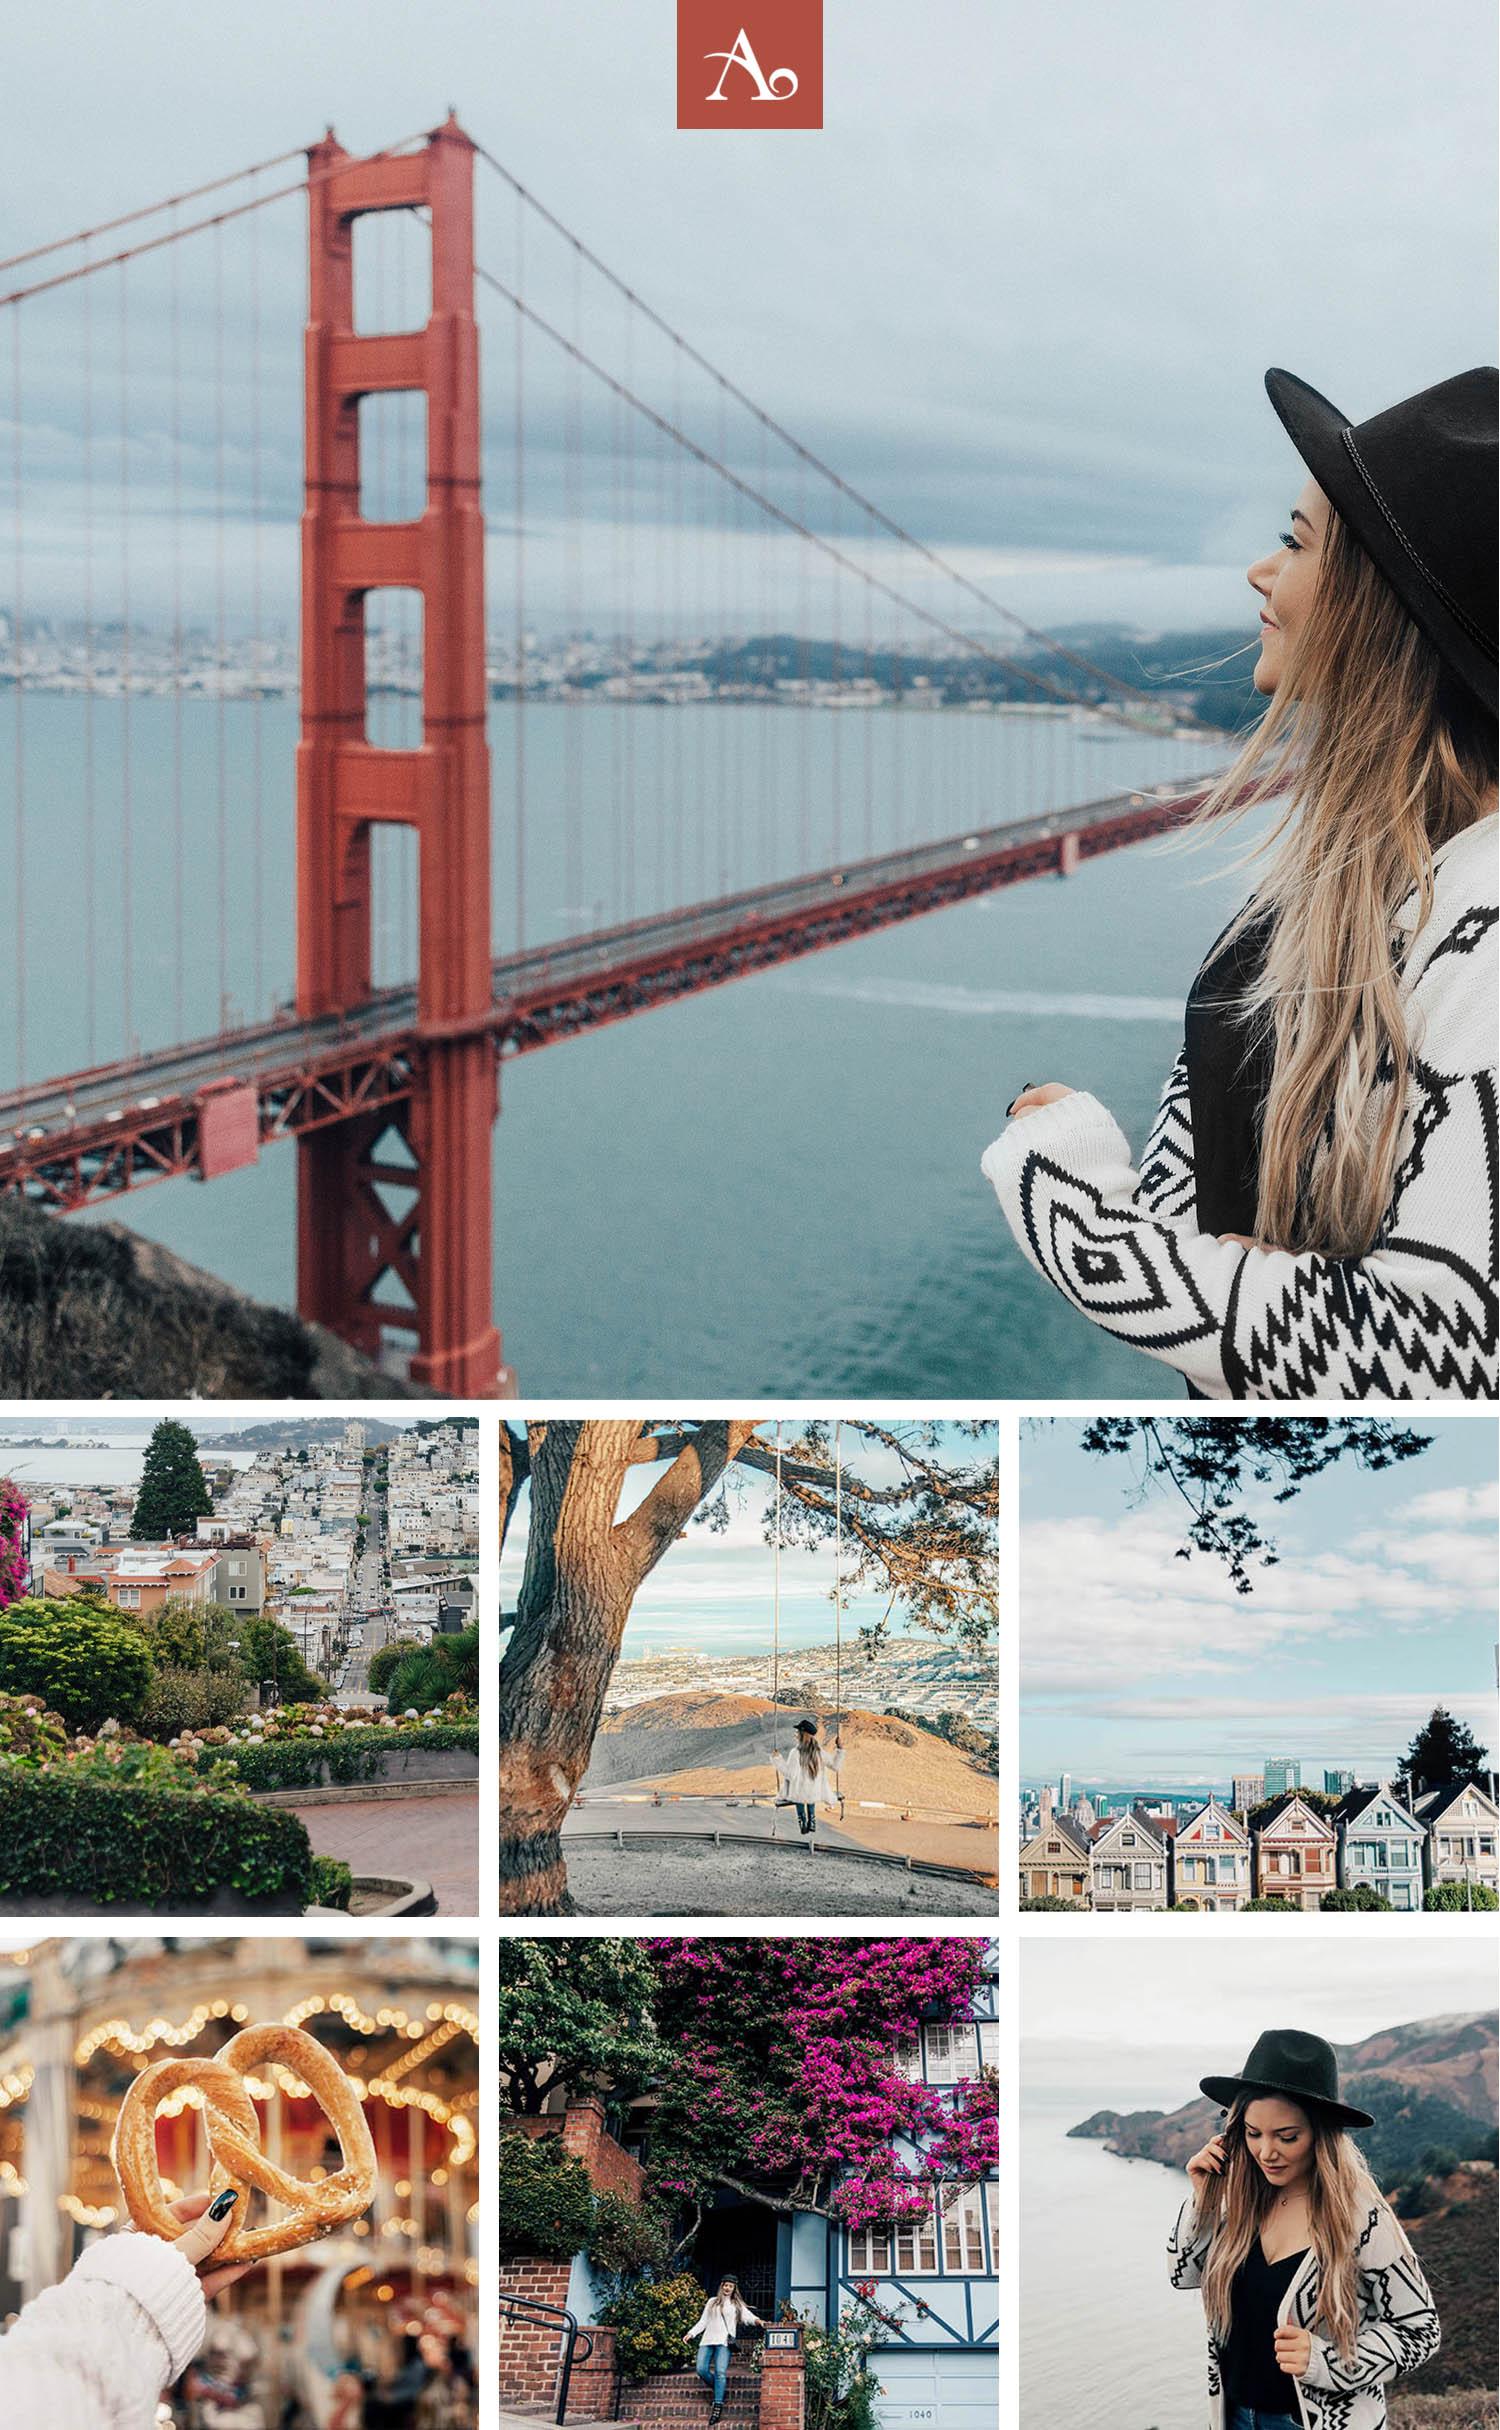 Instagram-Worthy Spots...